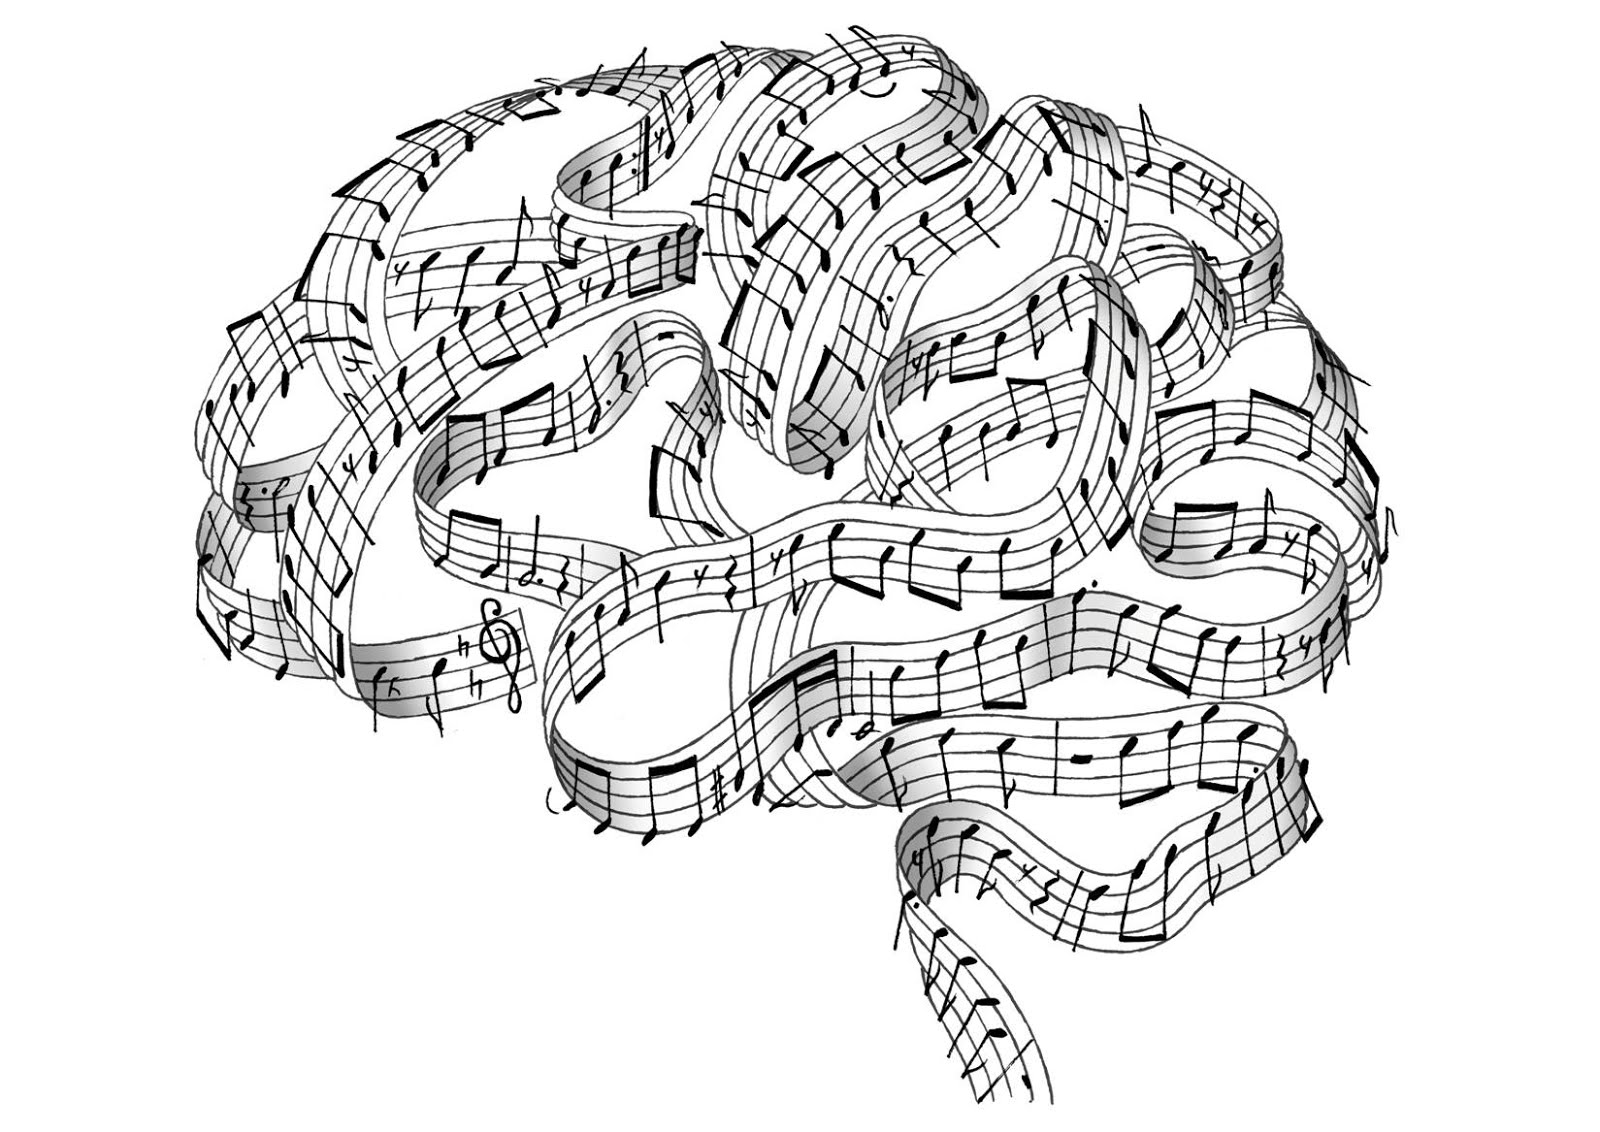 La música me hace pensar